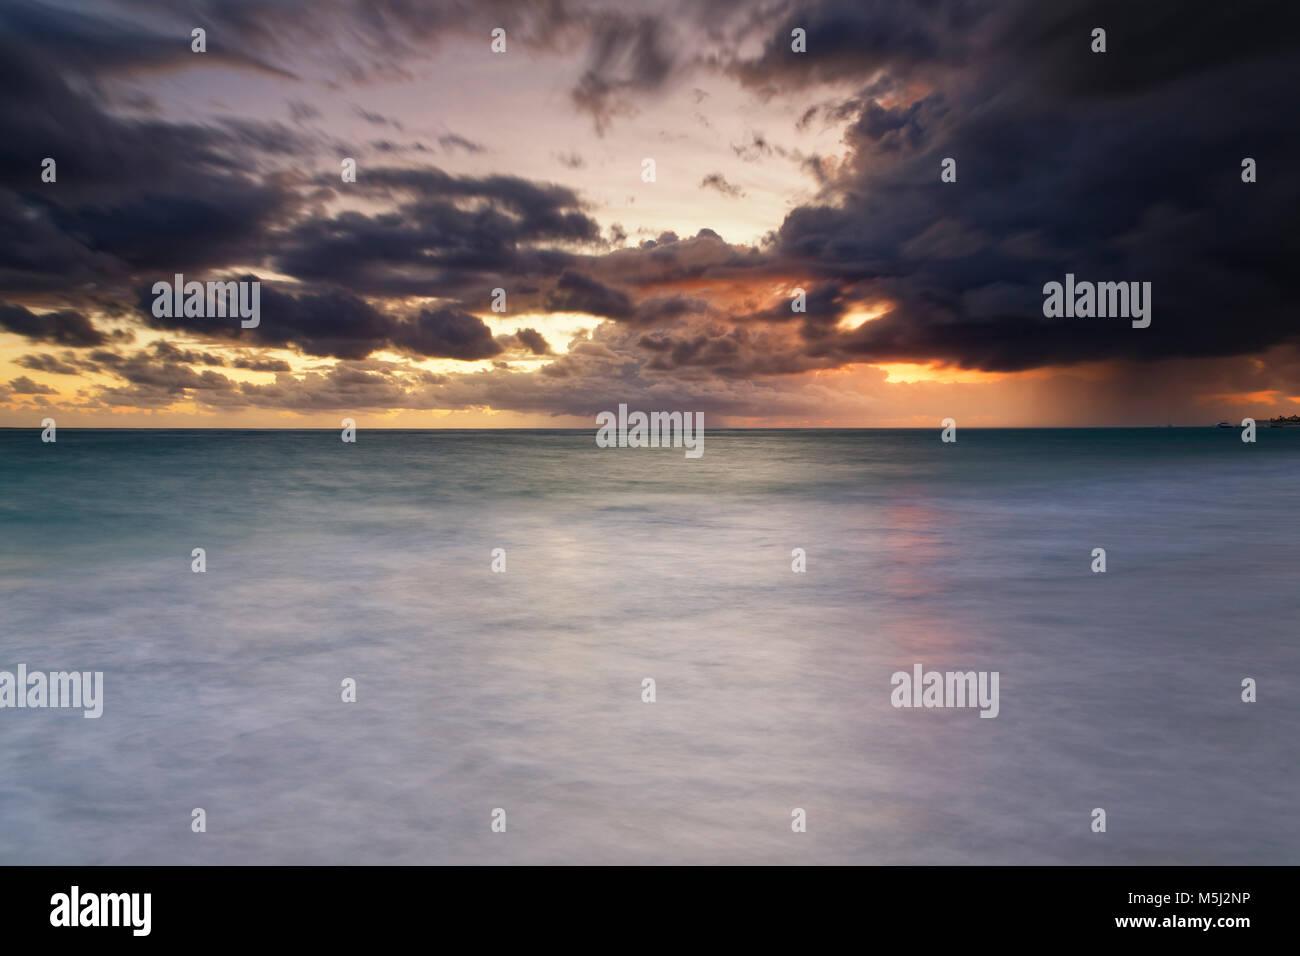 Carribean, Dominican Republic, Punta Cana, Playa Bavaro, view to the sea at sunrise - Stock Image